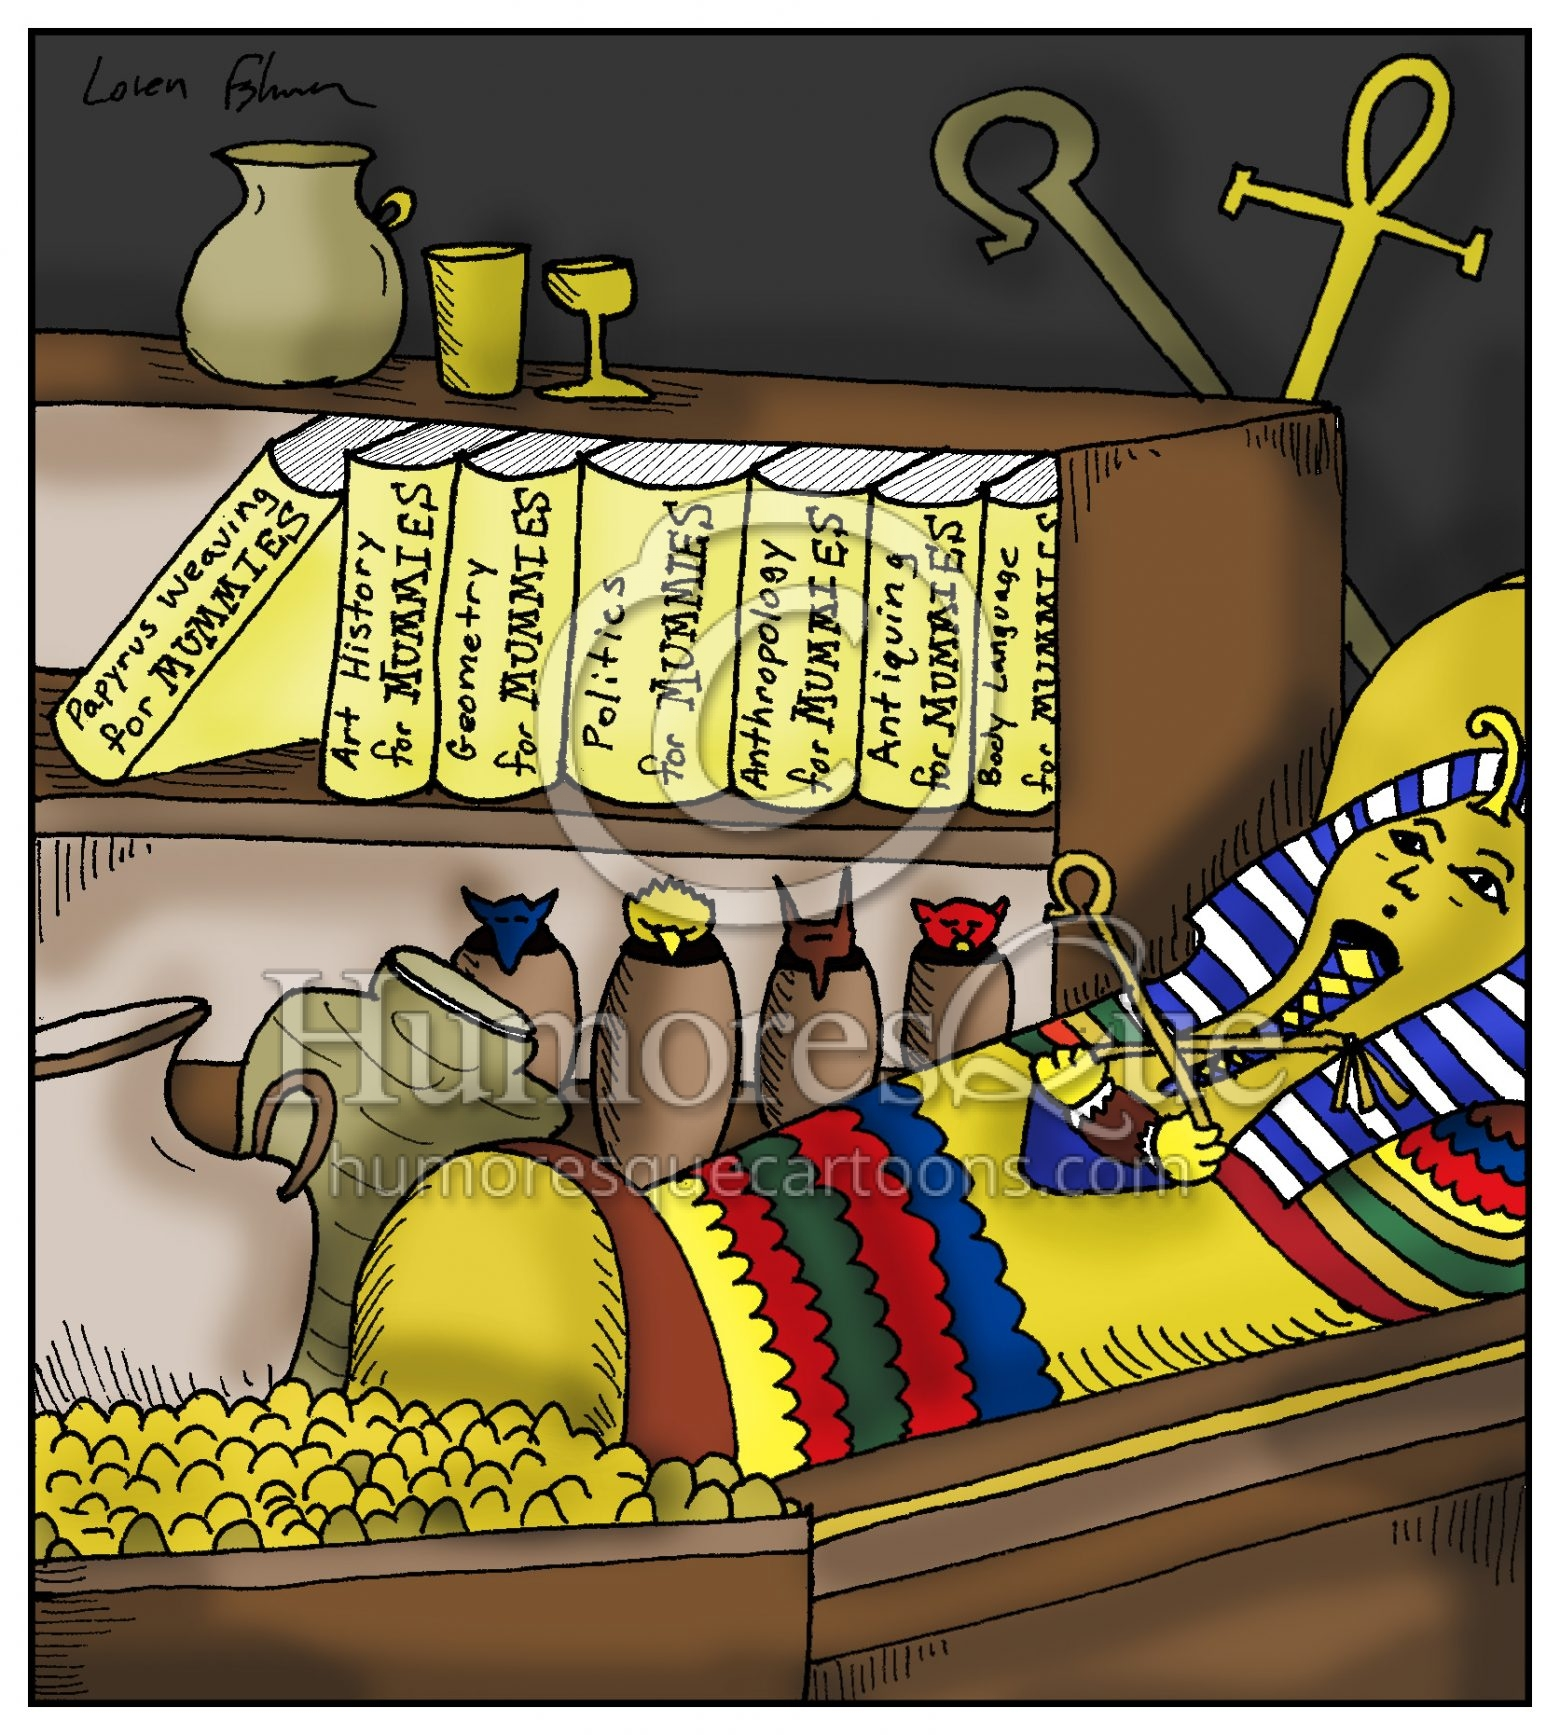 books for mummies ancient egypt history archaeology cartoon cartoon